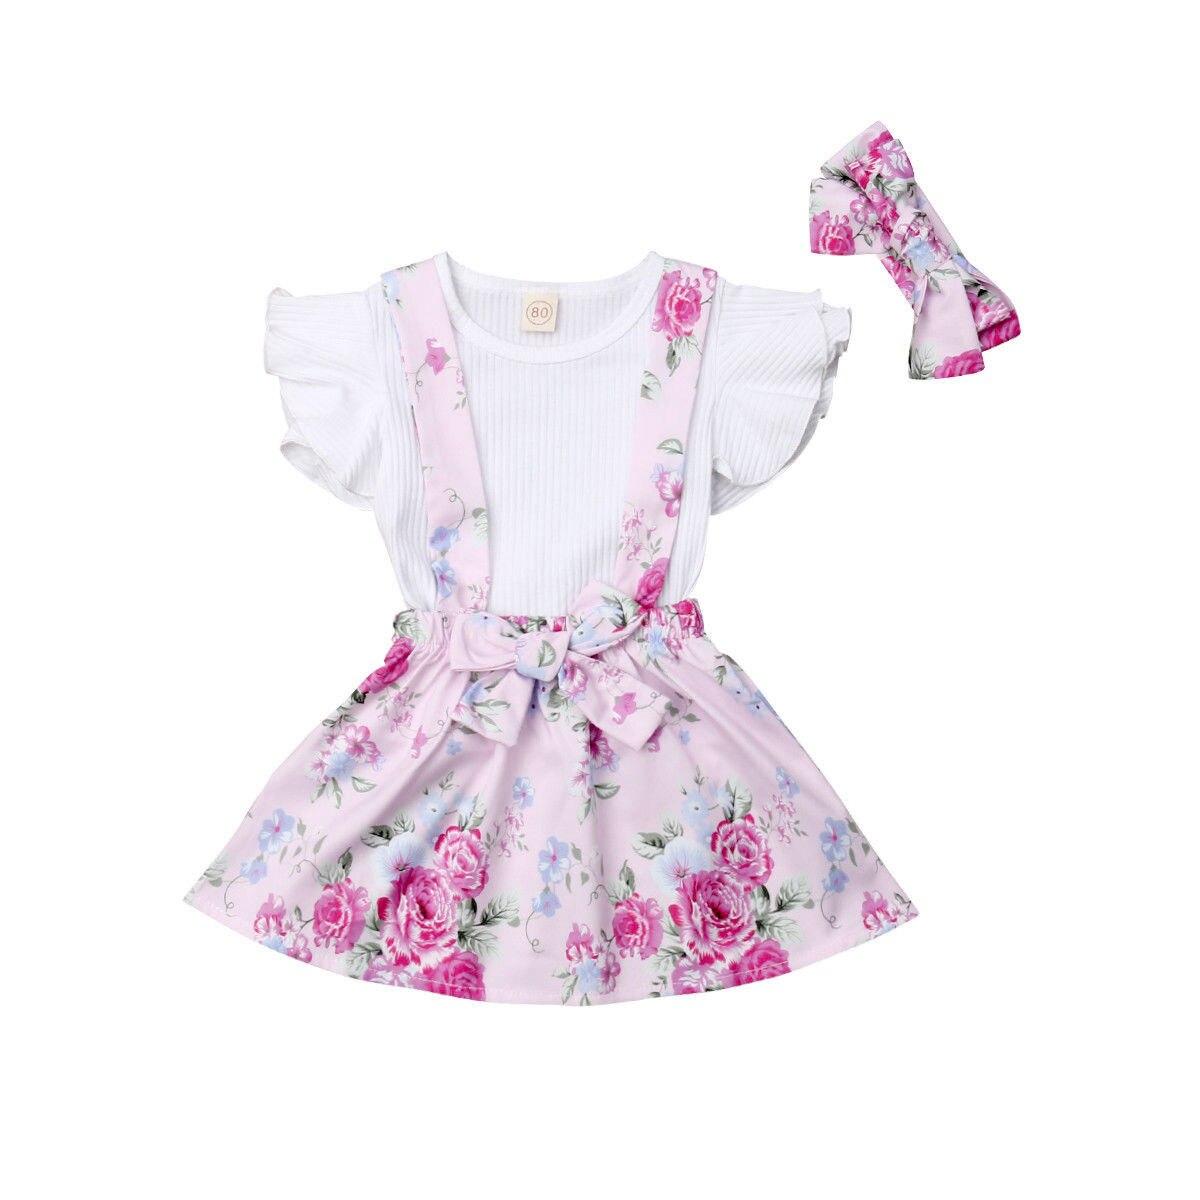 2018 Multitrust Brand Toddler Kid Baby Girls White Top Floral Princess Skirt Strap Pink Ruffle Sleeve Outfits Summer Sweet Set